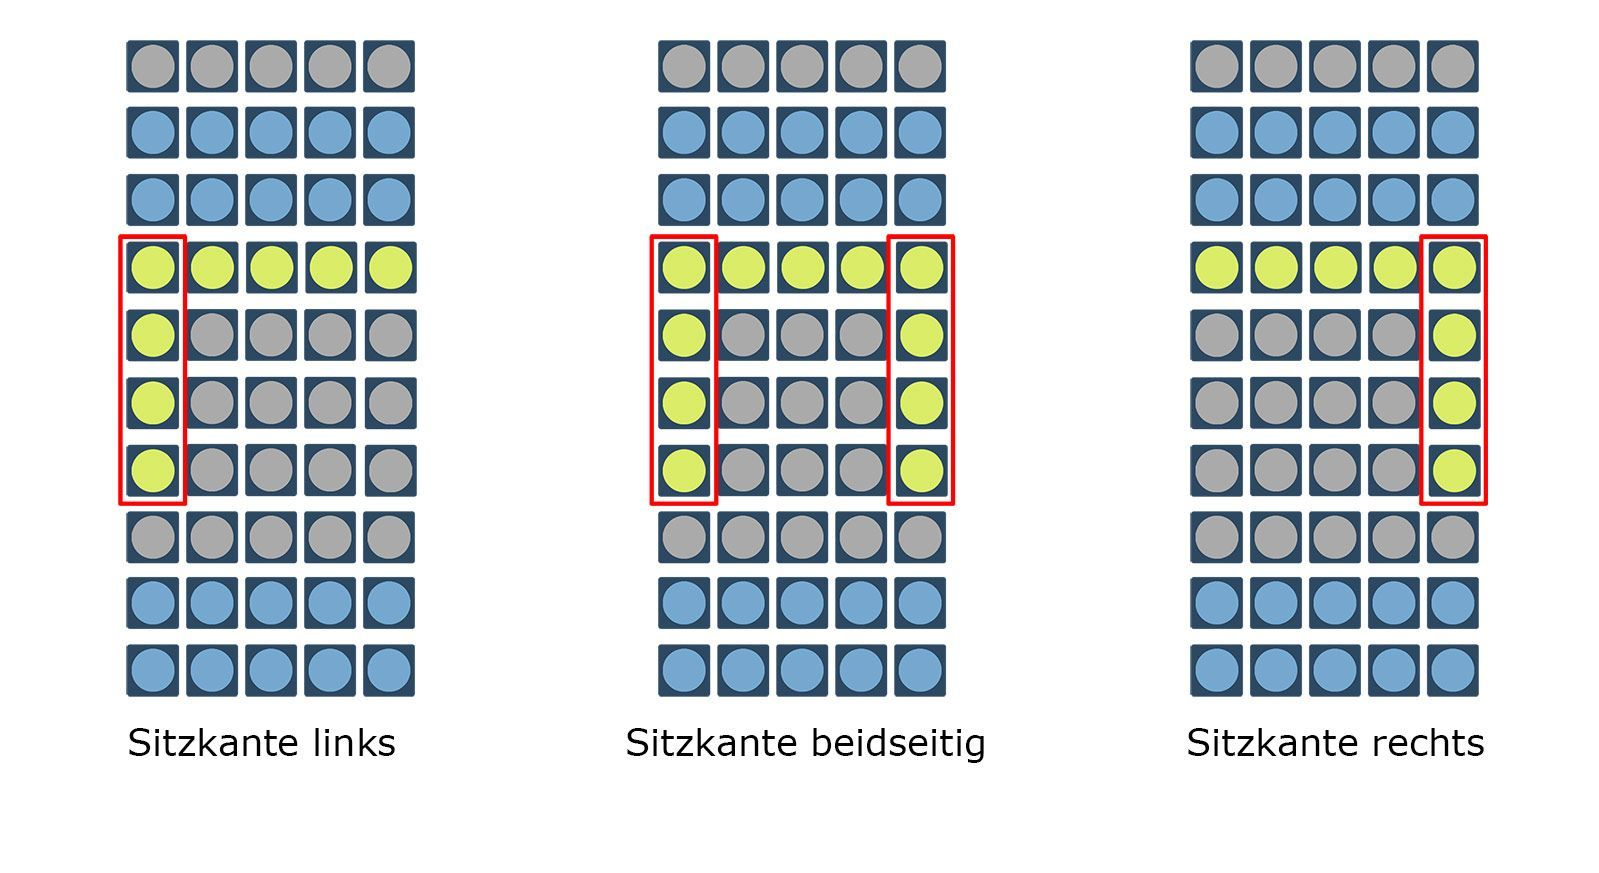 Grafik zu den Sitzkanten-Positionen der orthowell Lattenroste